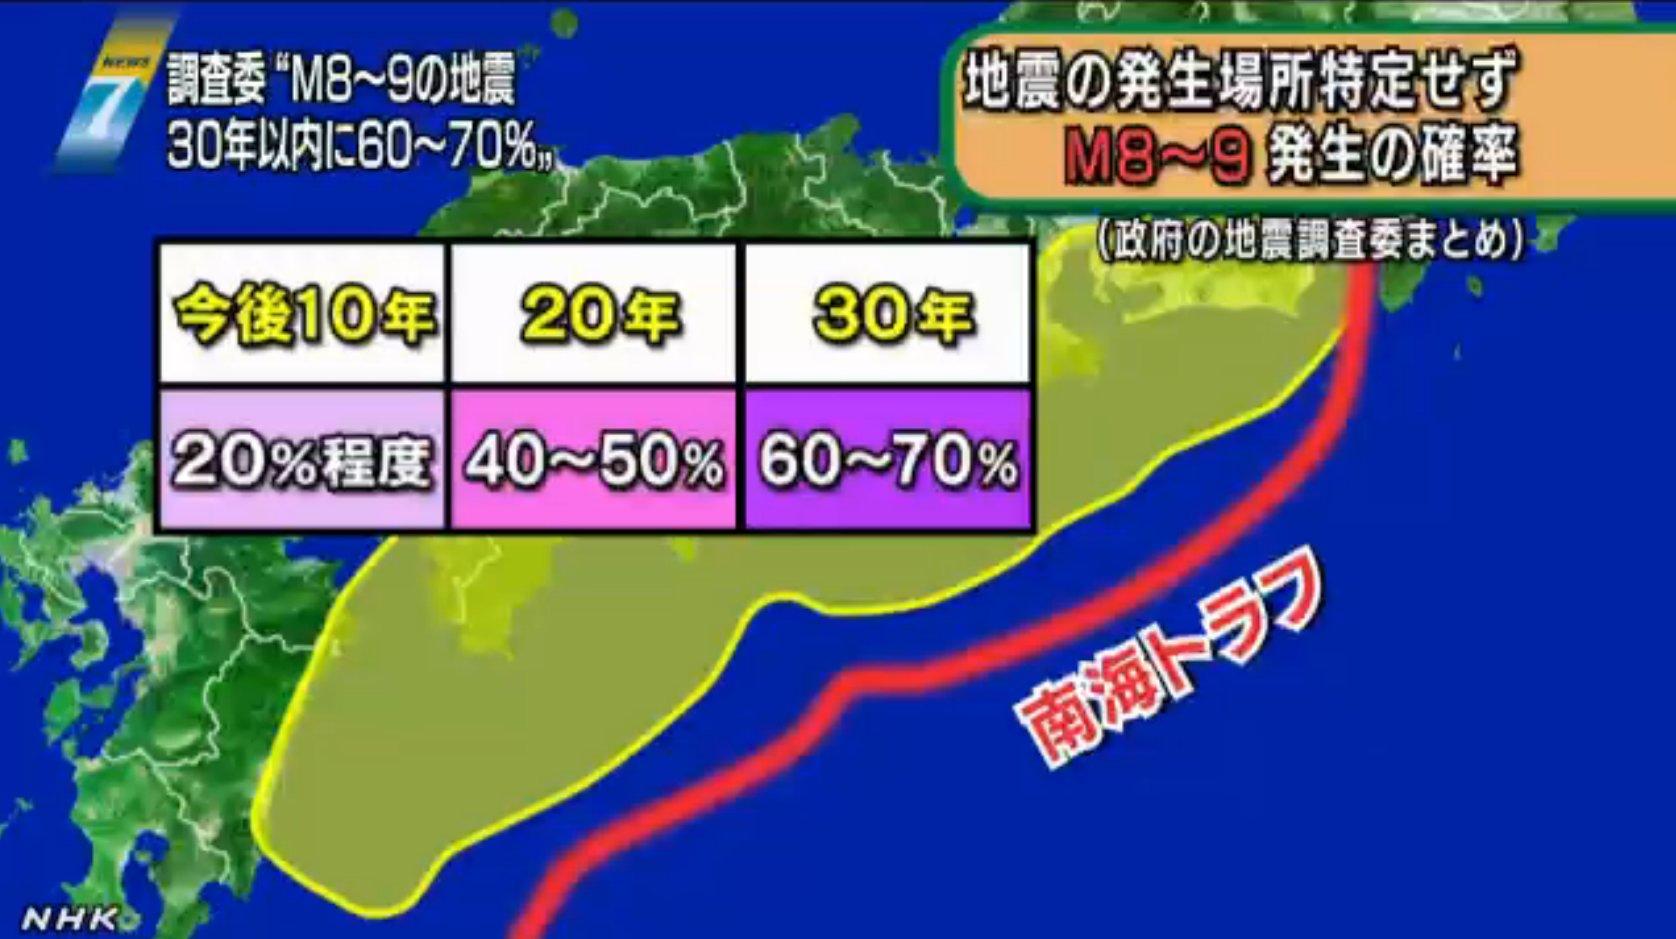 nannkaitorahu kakuritu.jpg?resize=1200,630 - 【南海地震予測】他の震災との関連性と発生時期。気になる被害規模は?